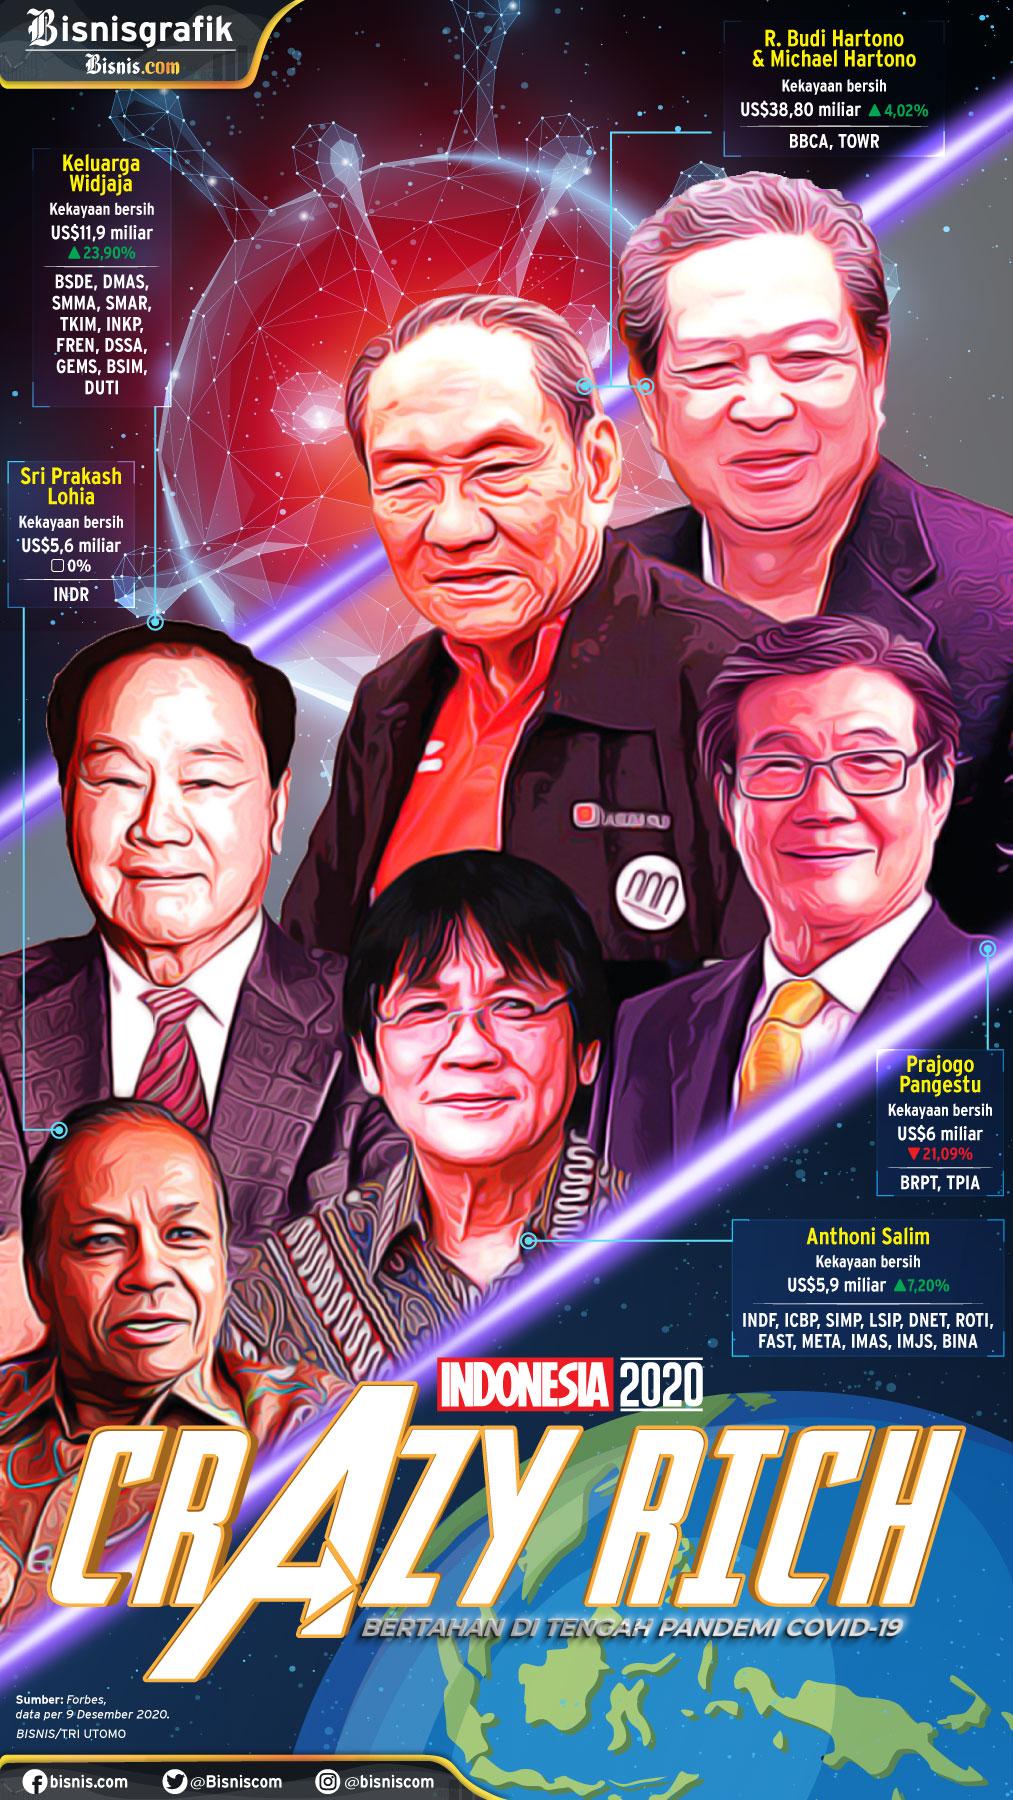 Crazy Rich Indonesia 2020 - BISNIS - Tri Utomo